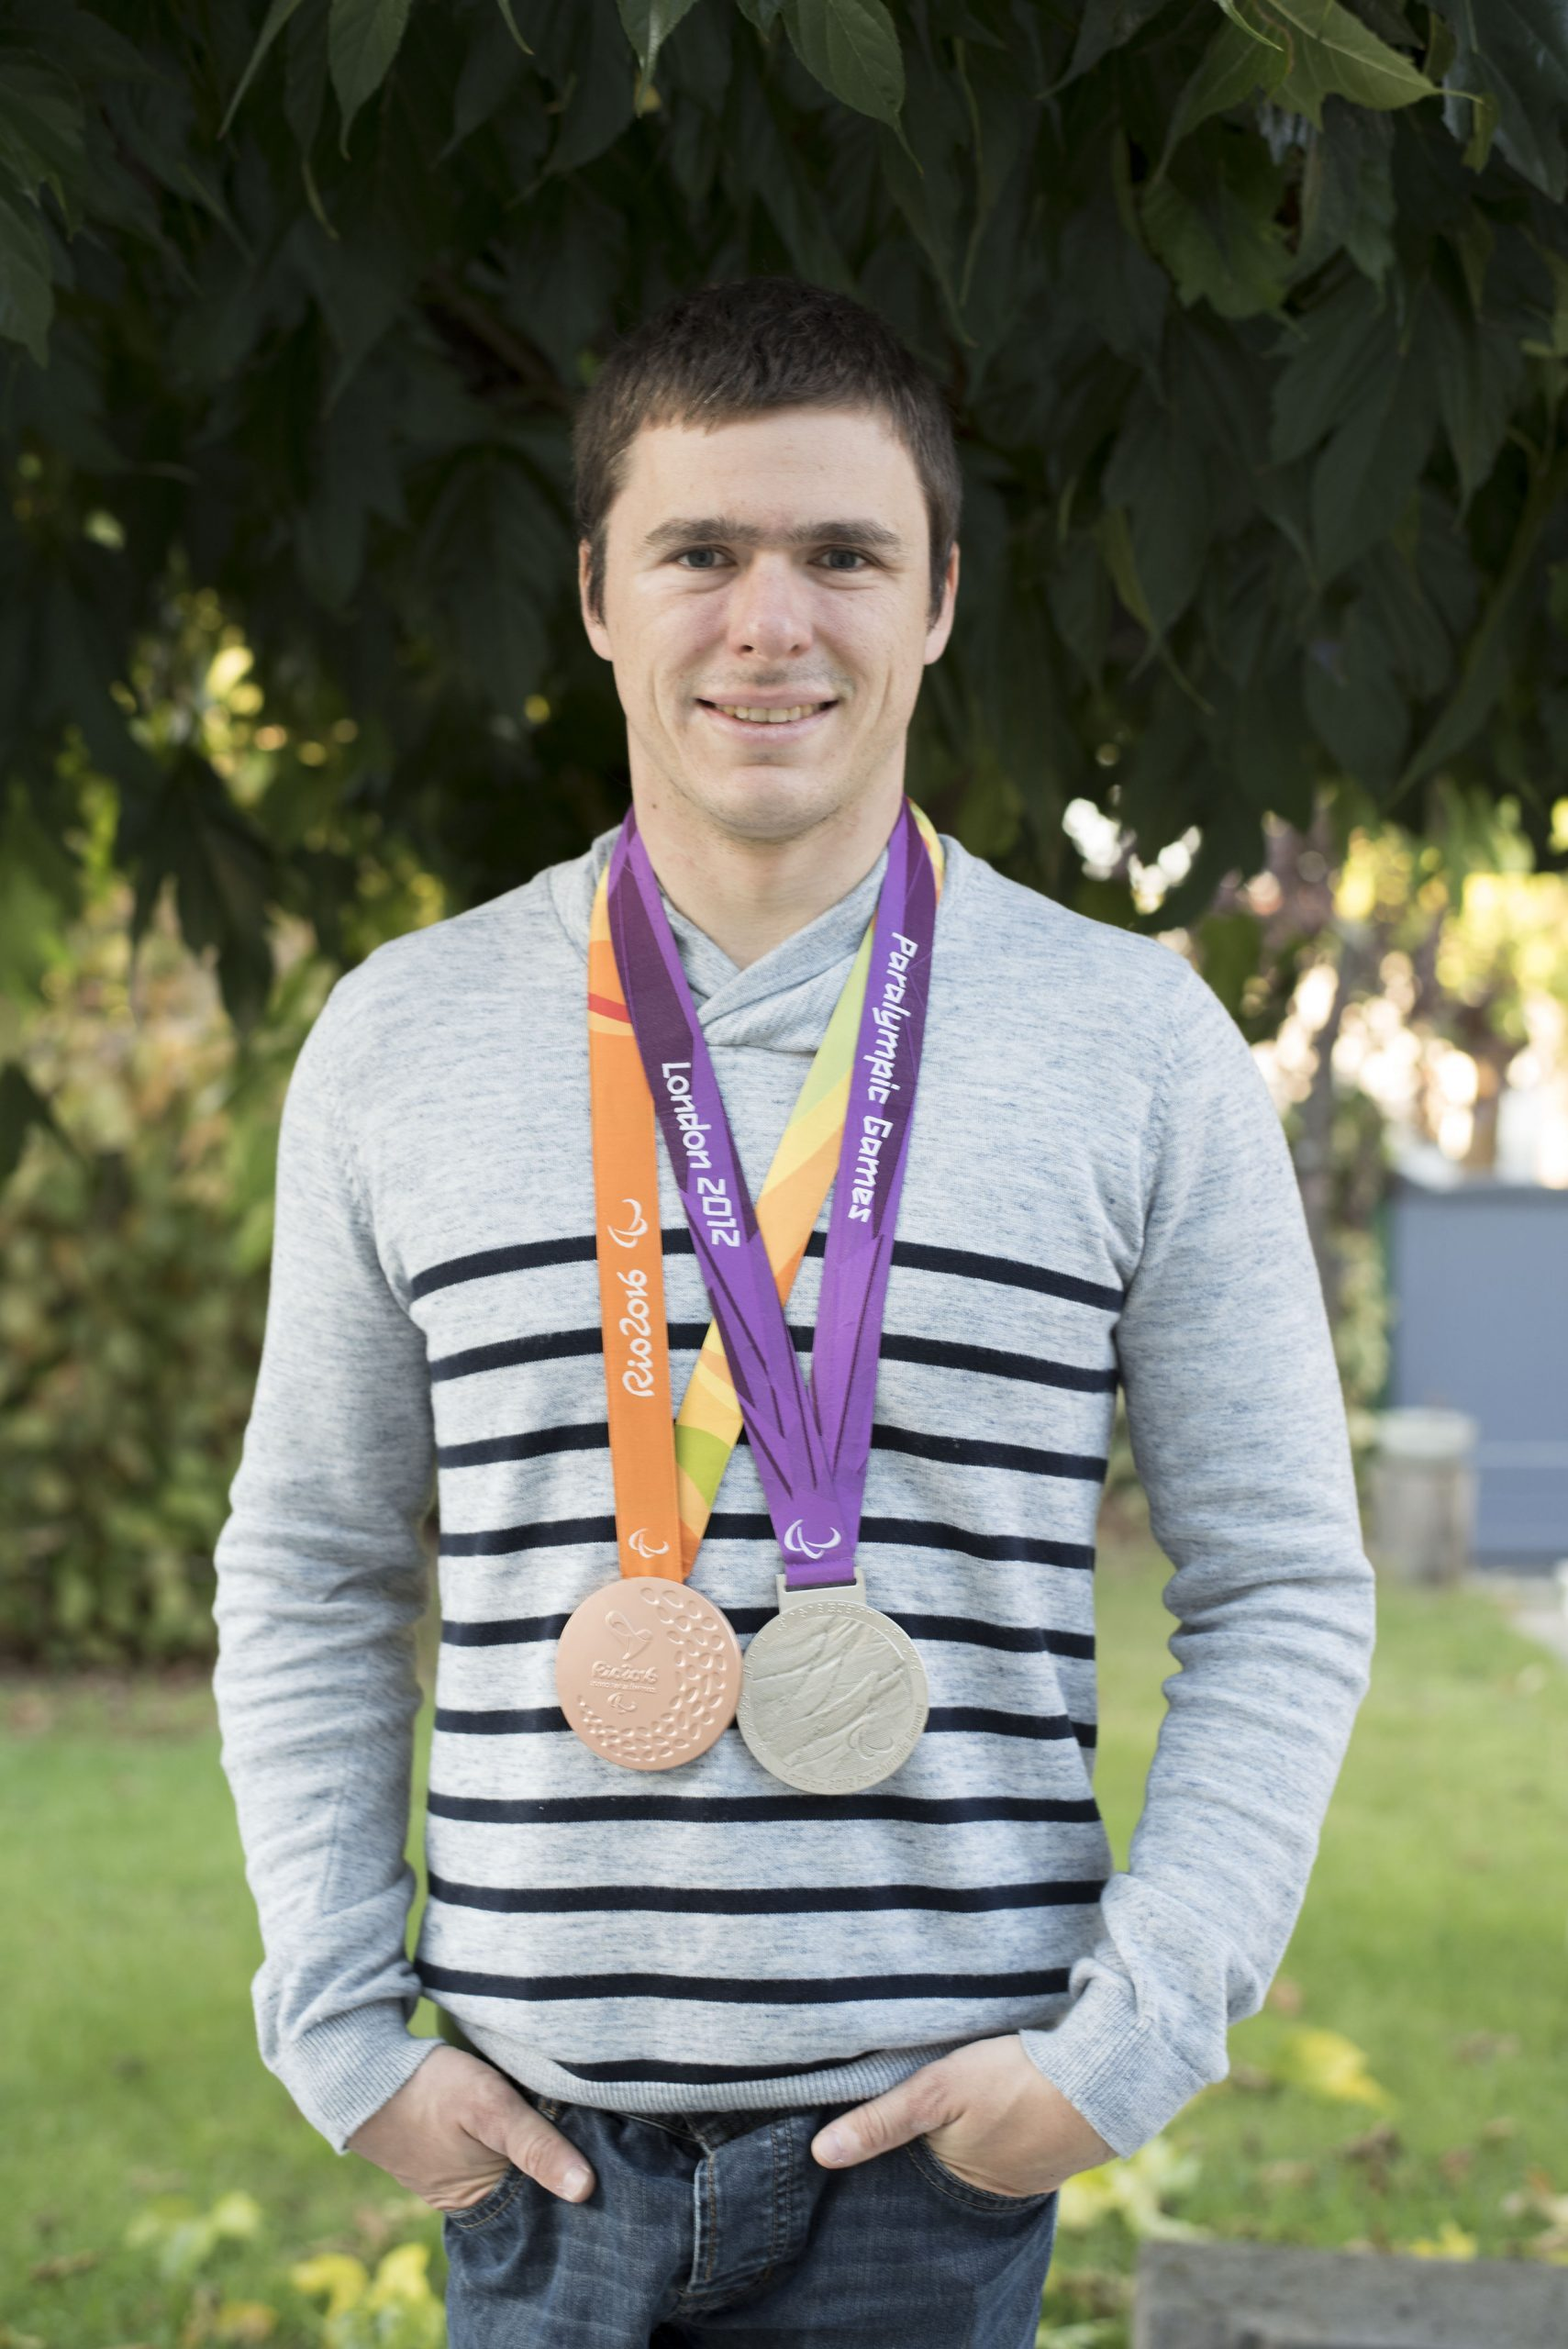 Ludovic Lemoine, champion d'escrime handisport